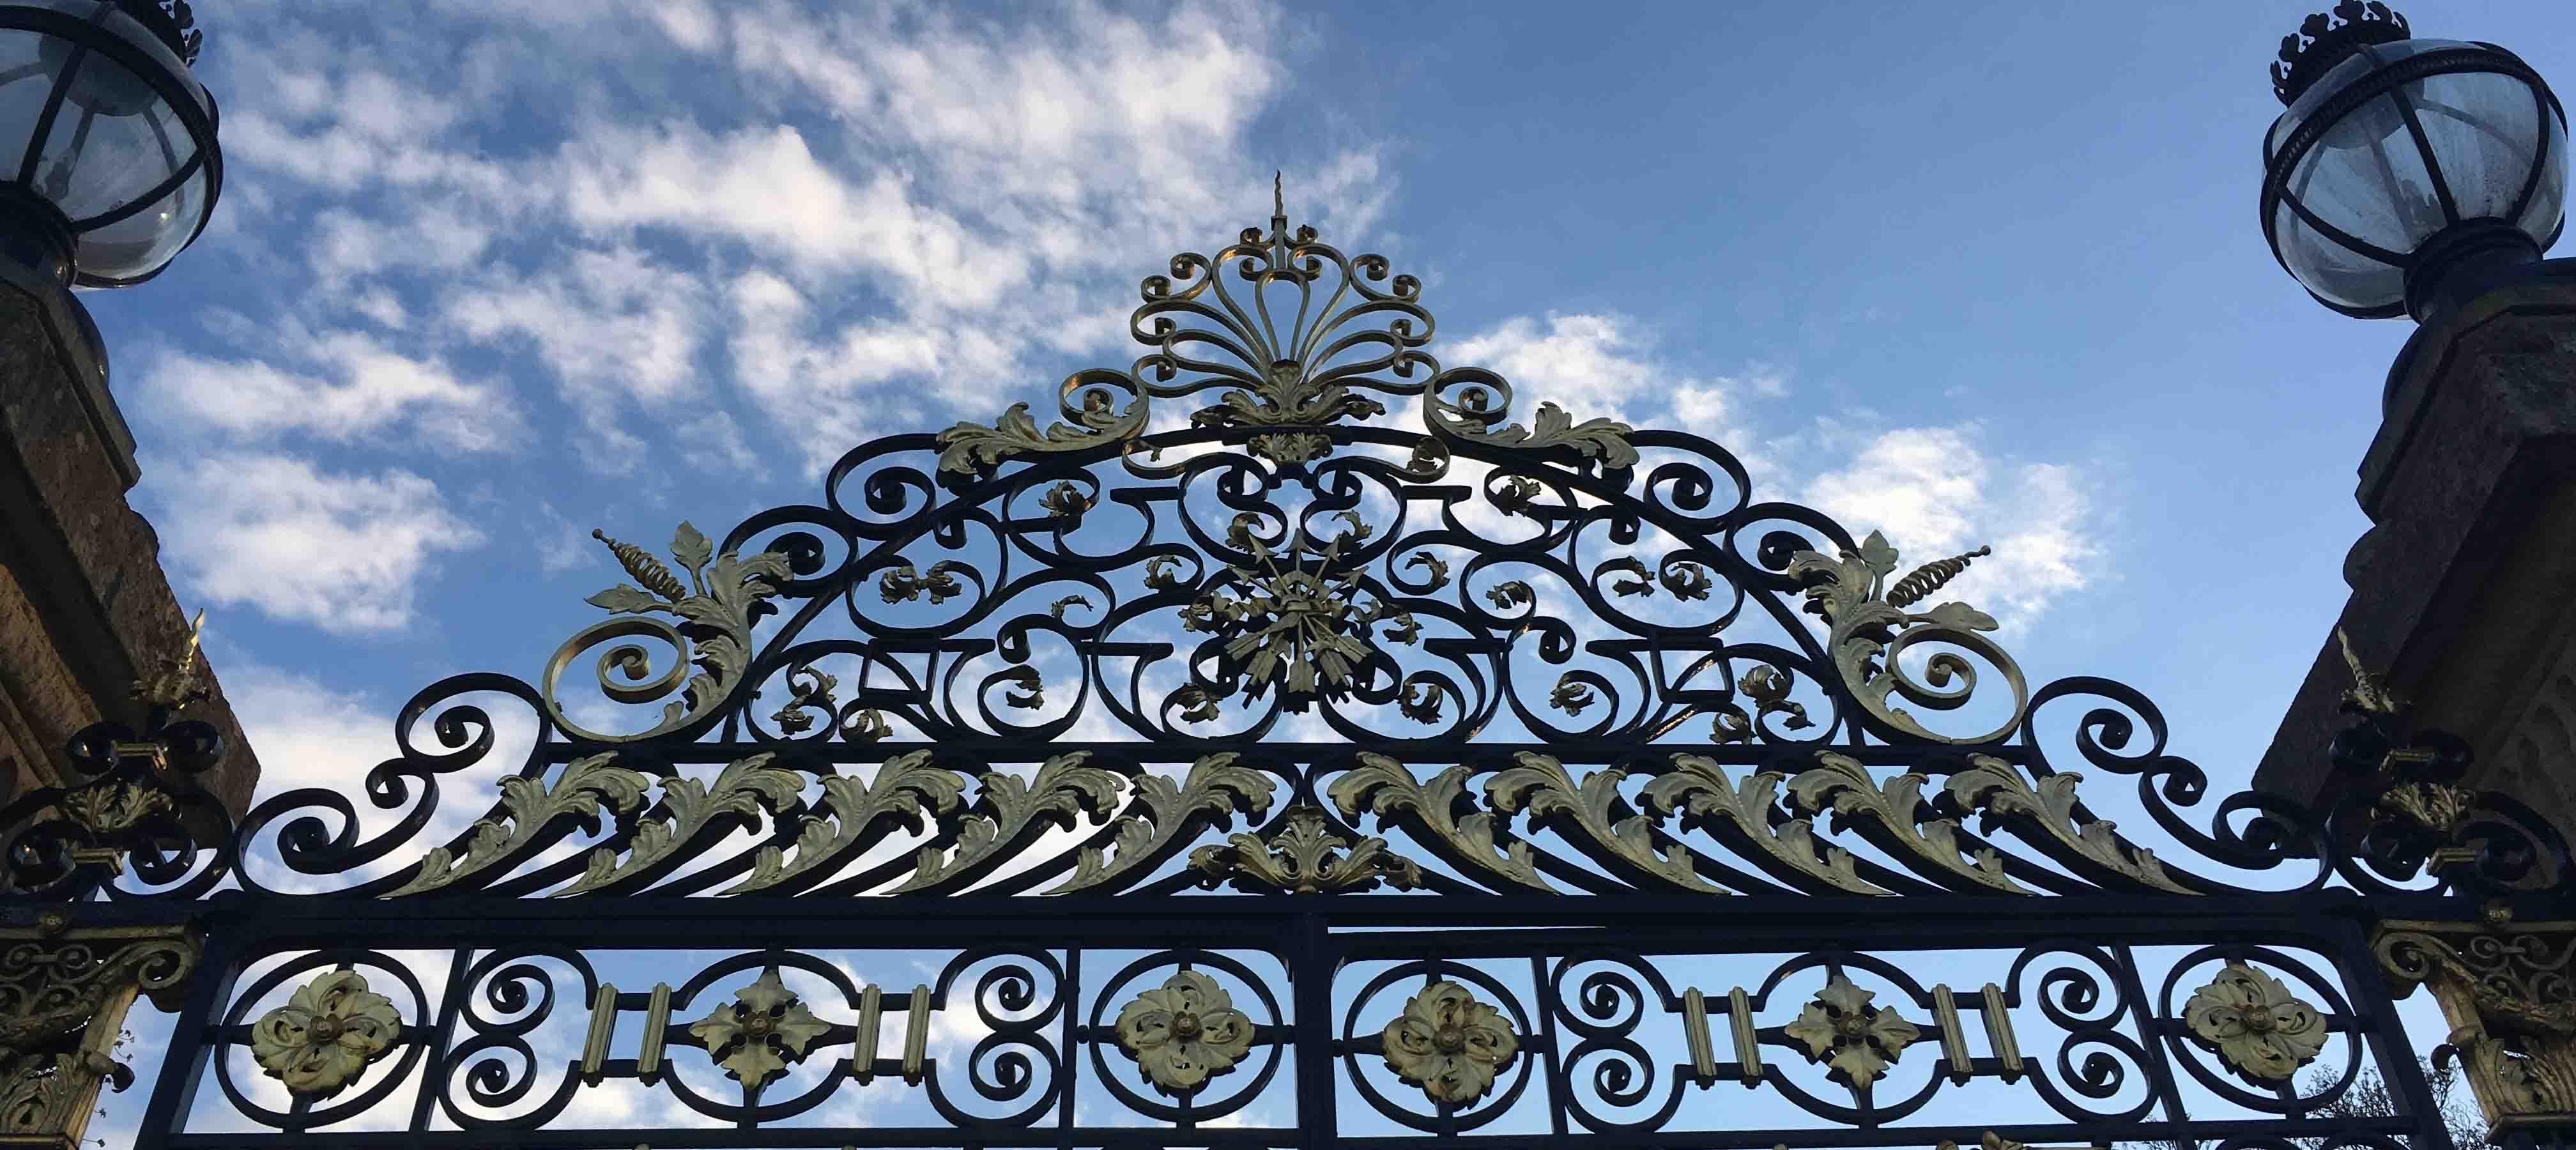 Indgangen til Waddesdon Manor, England